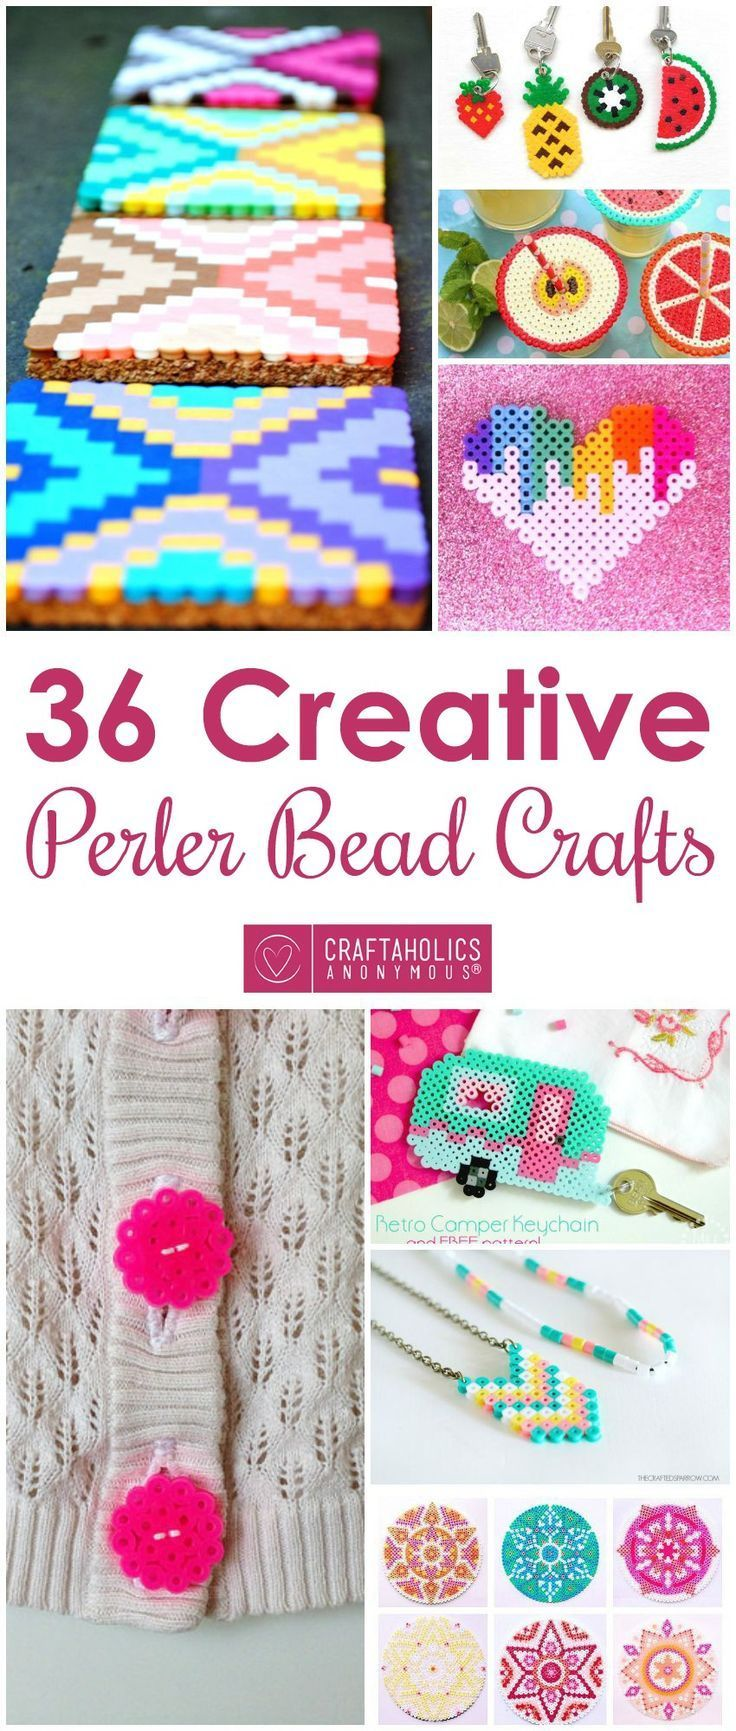 36 Creative and Nostalgic Perler Bead Crafts | Craftaholics Anonymous®